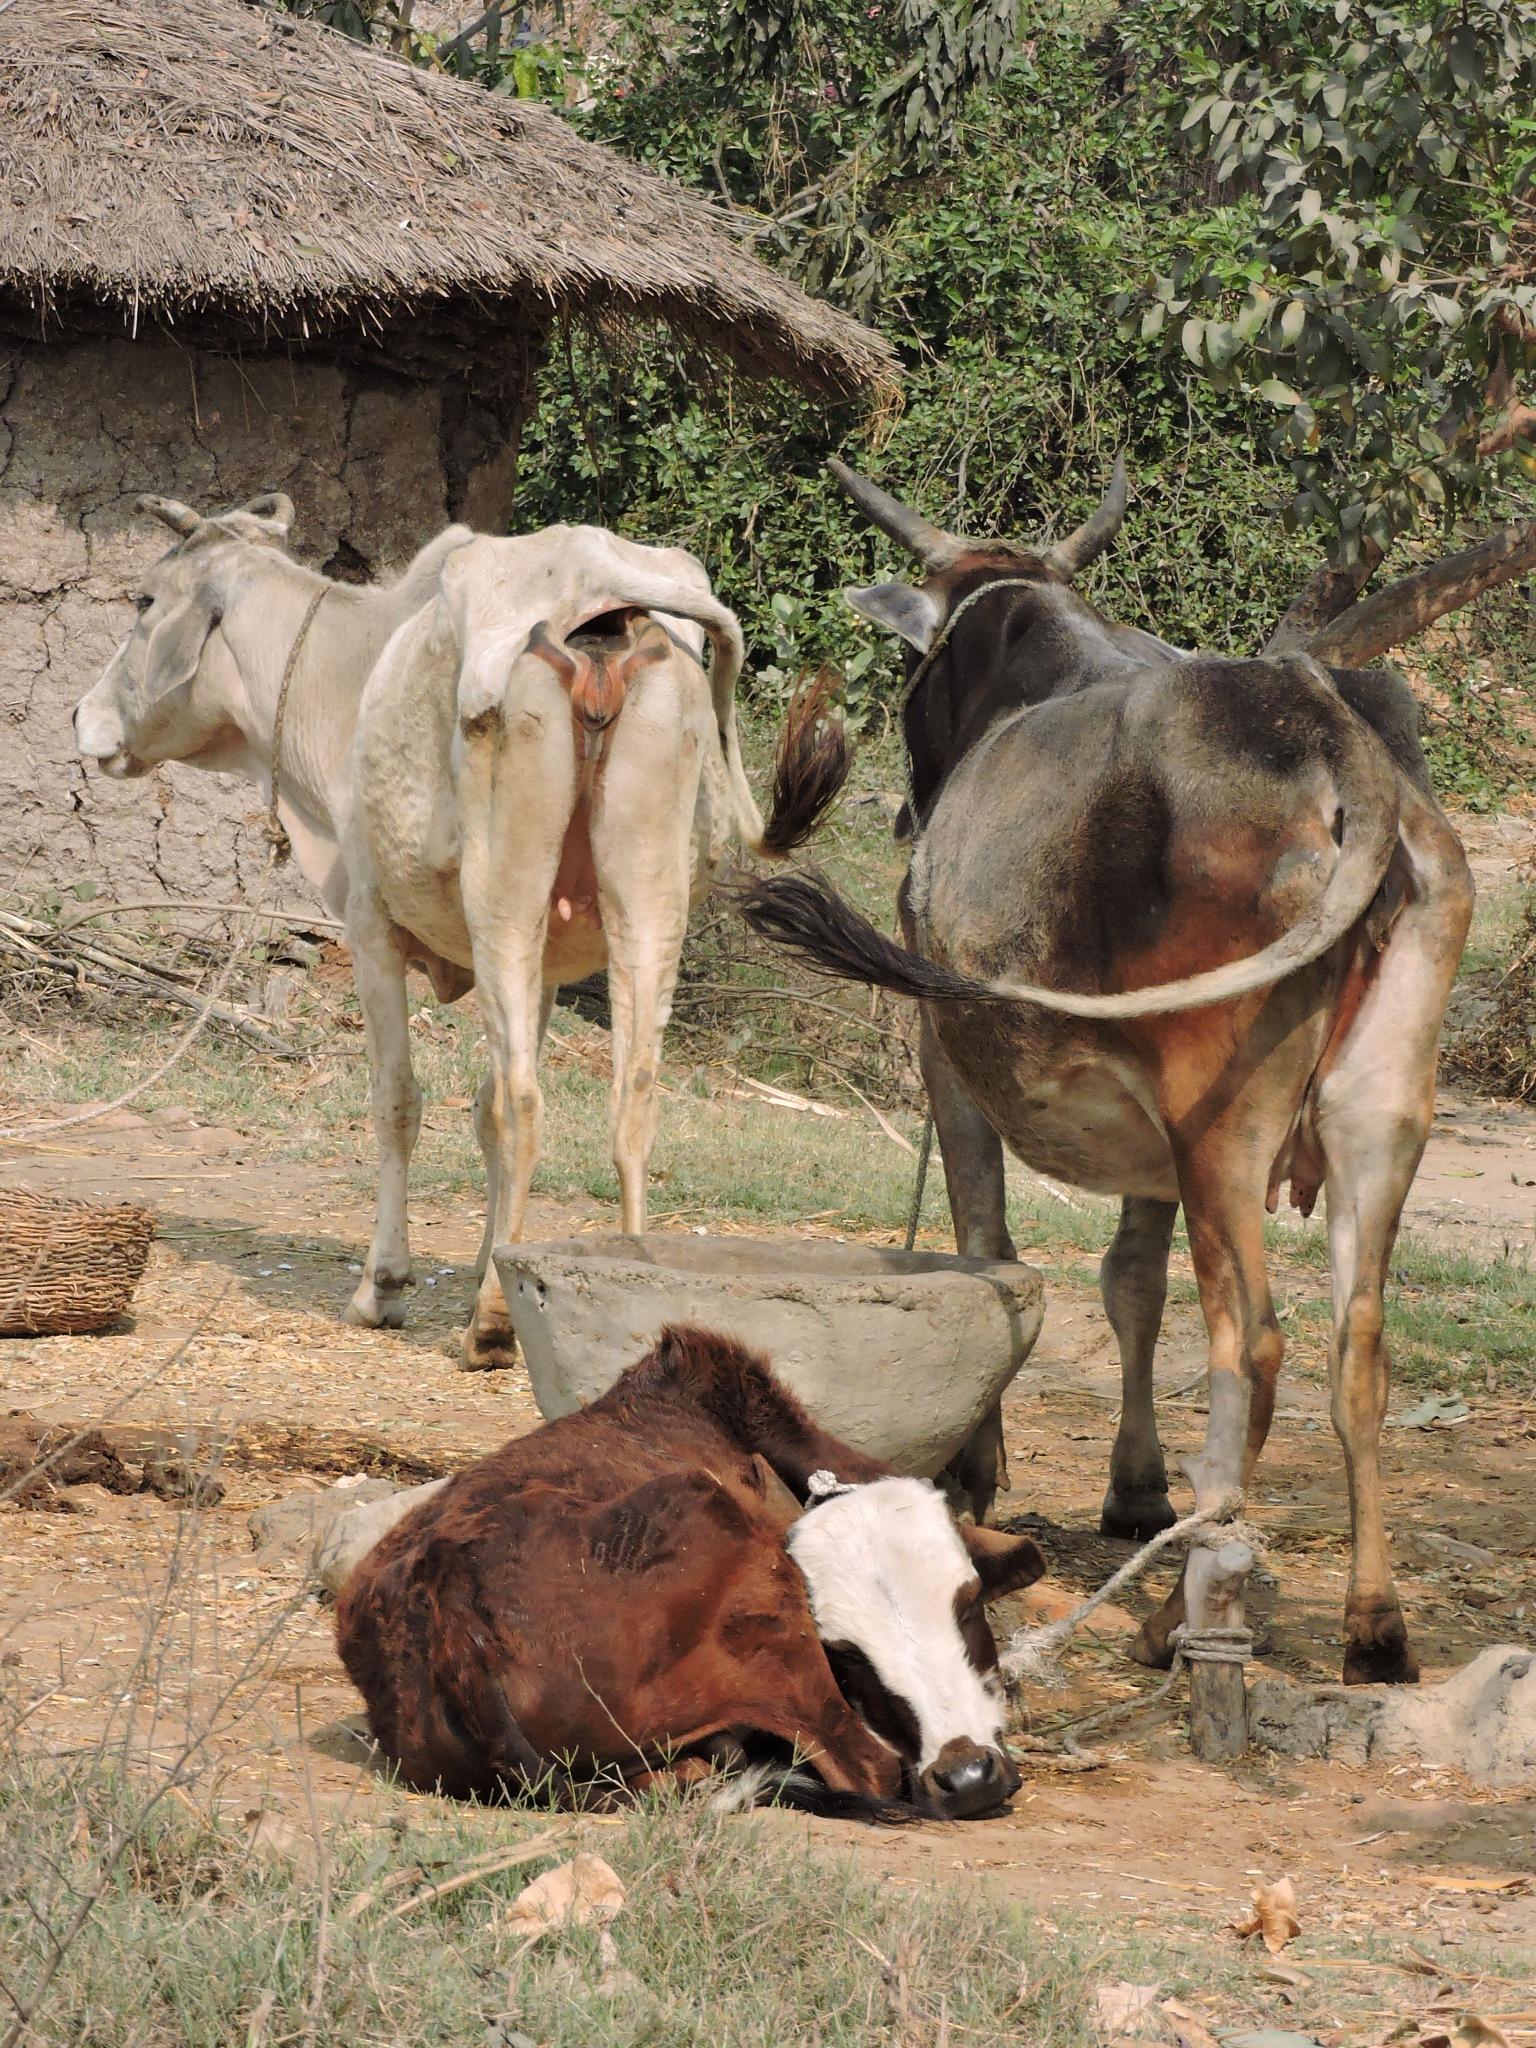 rural india by annapoorna.sitaram